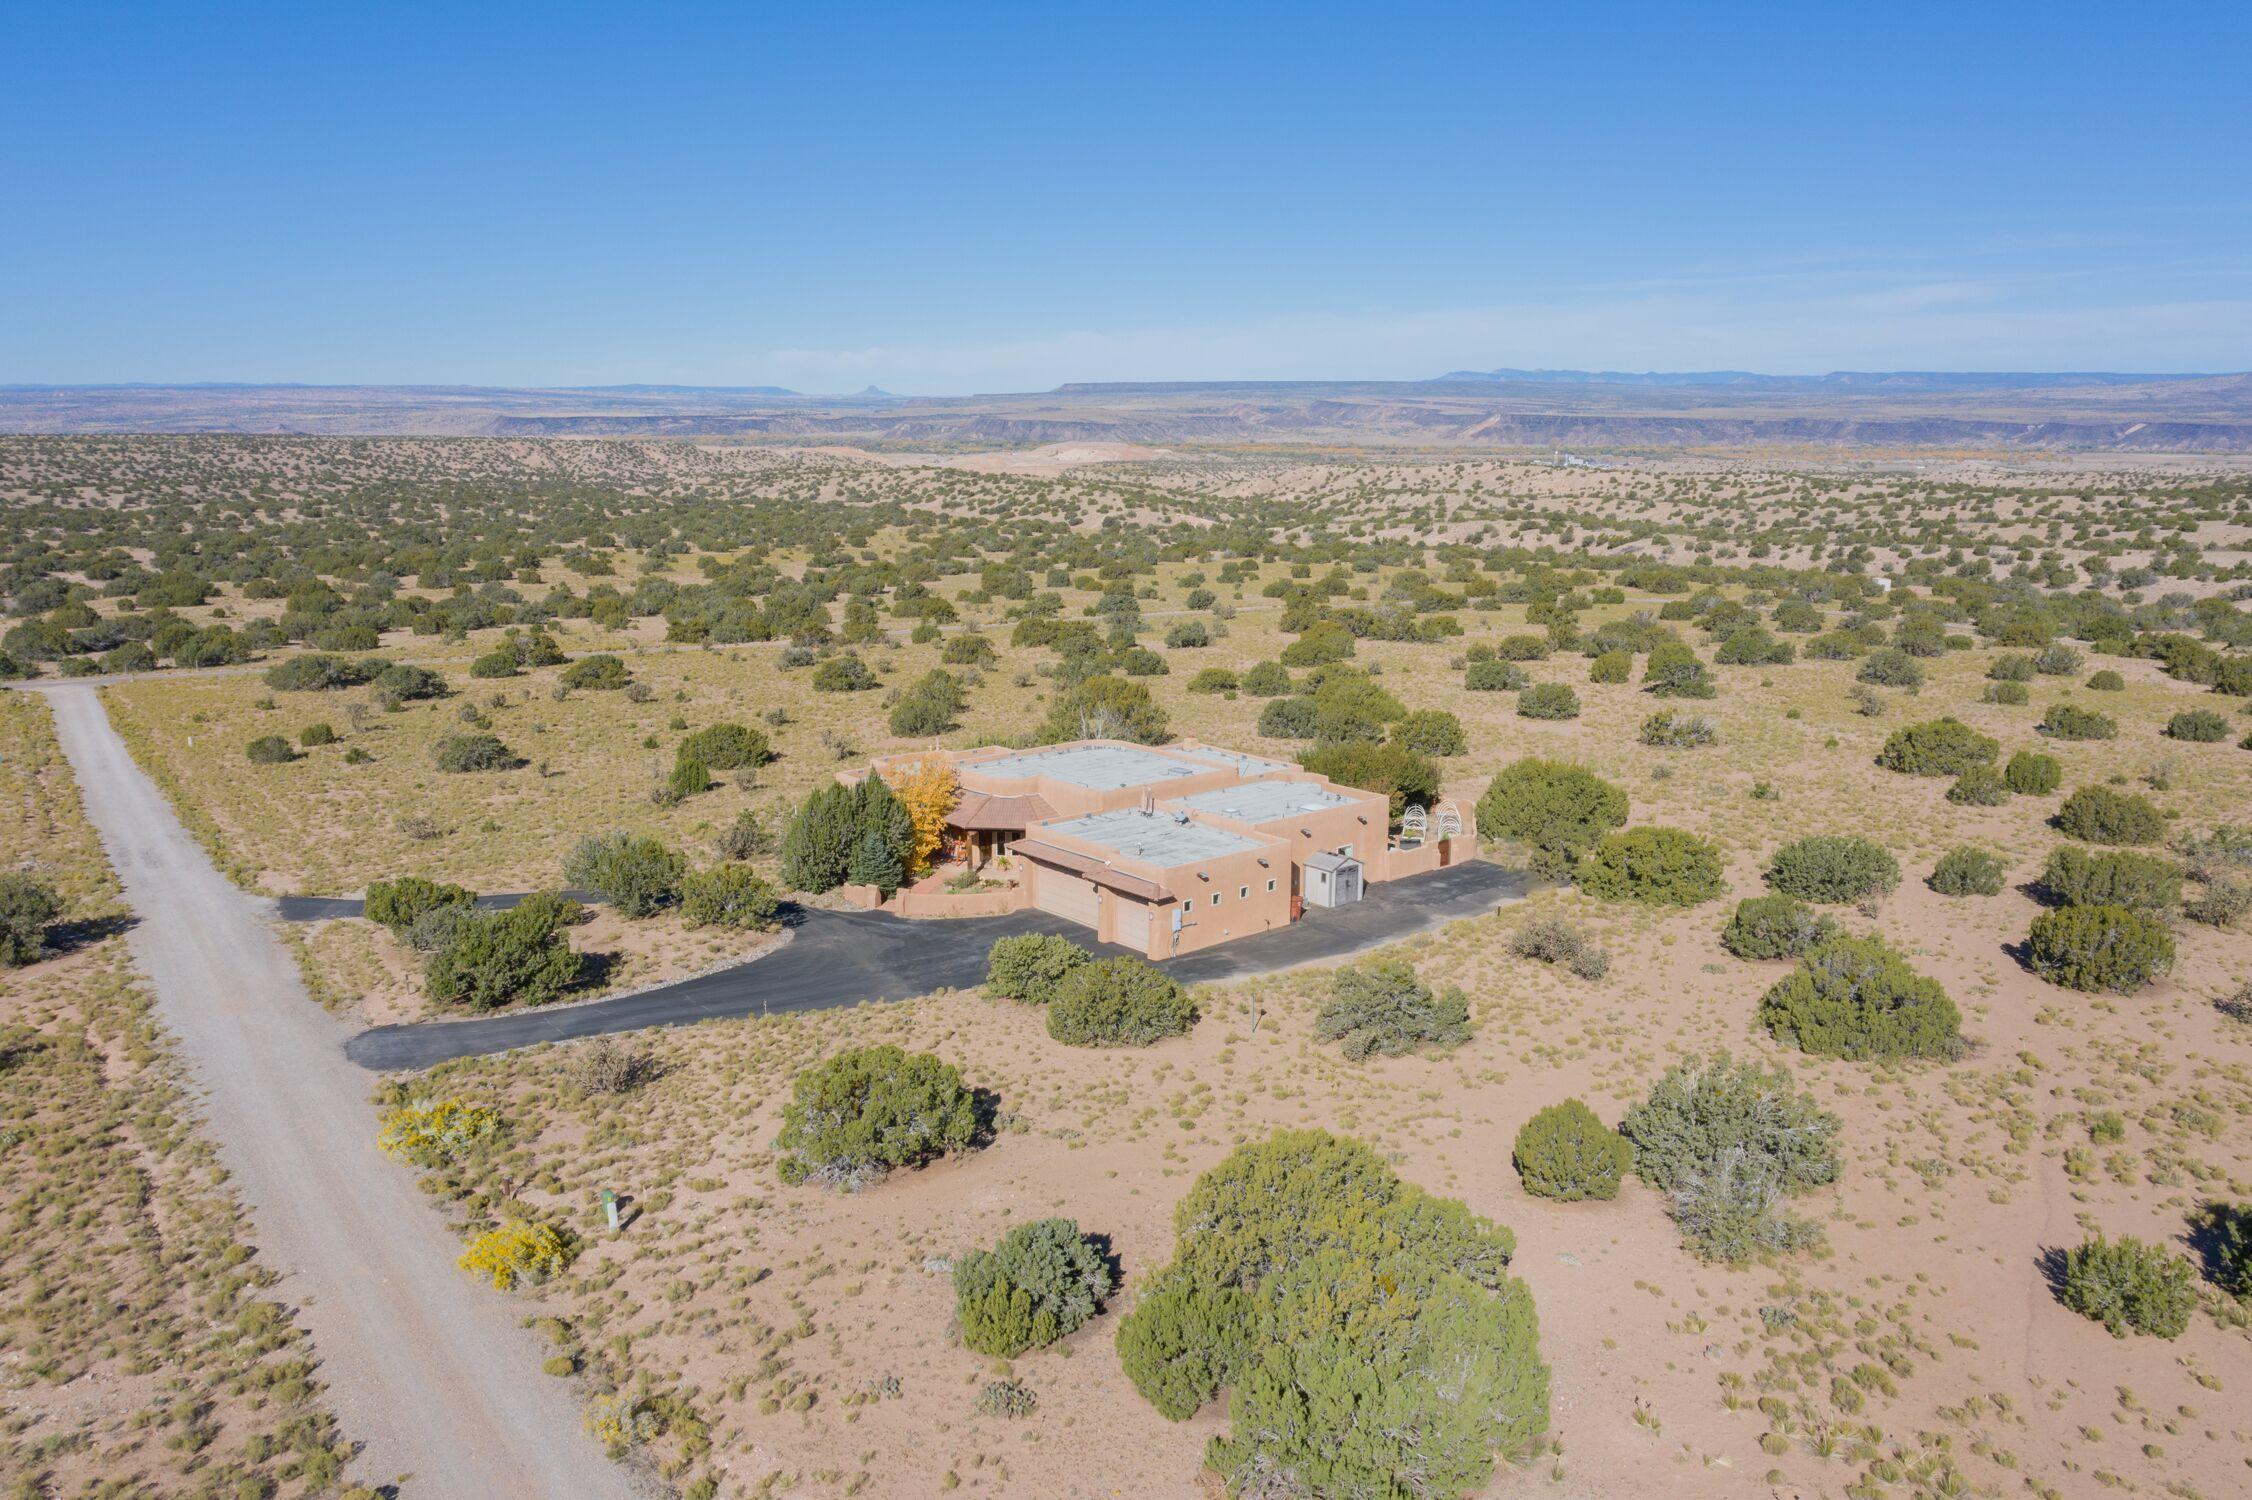 7 PALOMAR Road, Placitas, NM 87043 - Placitas, NM real estate listing